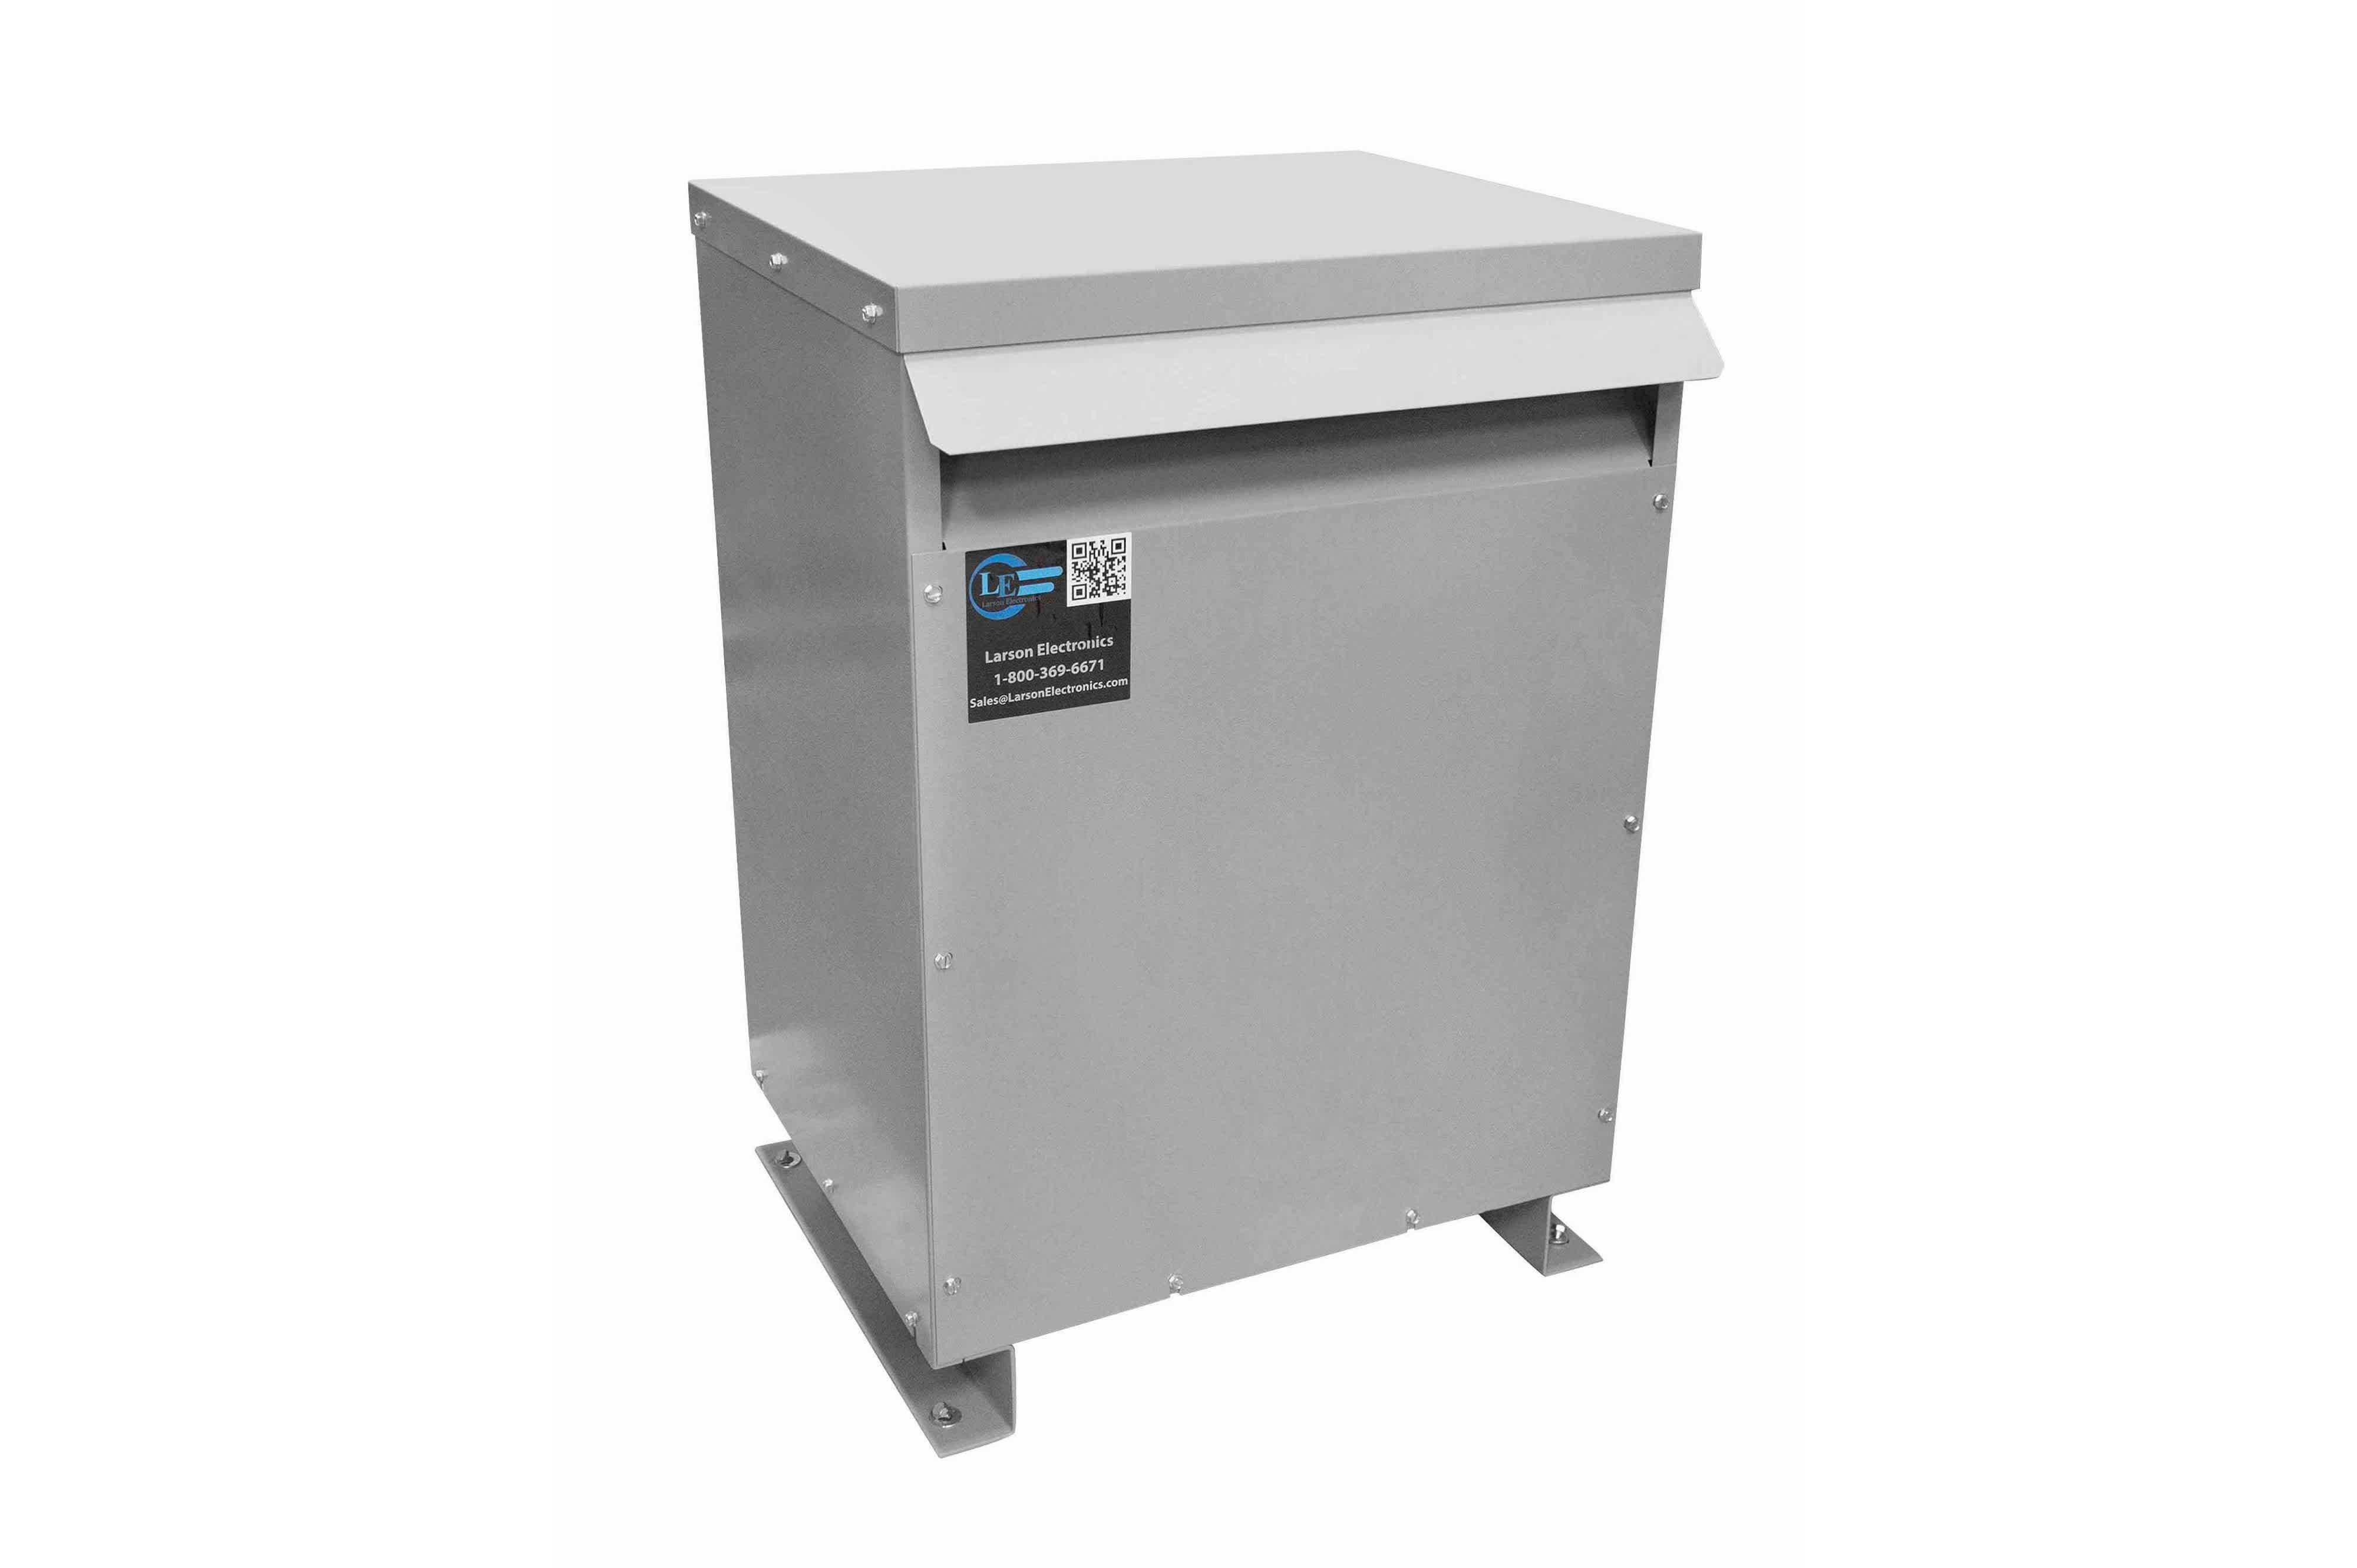 20 kVA 3PH Isolation Transformer, 208V Wye Primary, 600V Delta Secondary, N3R, Ventilated, 60 Hz